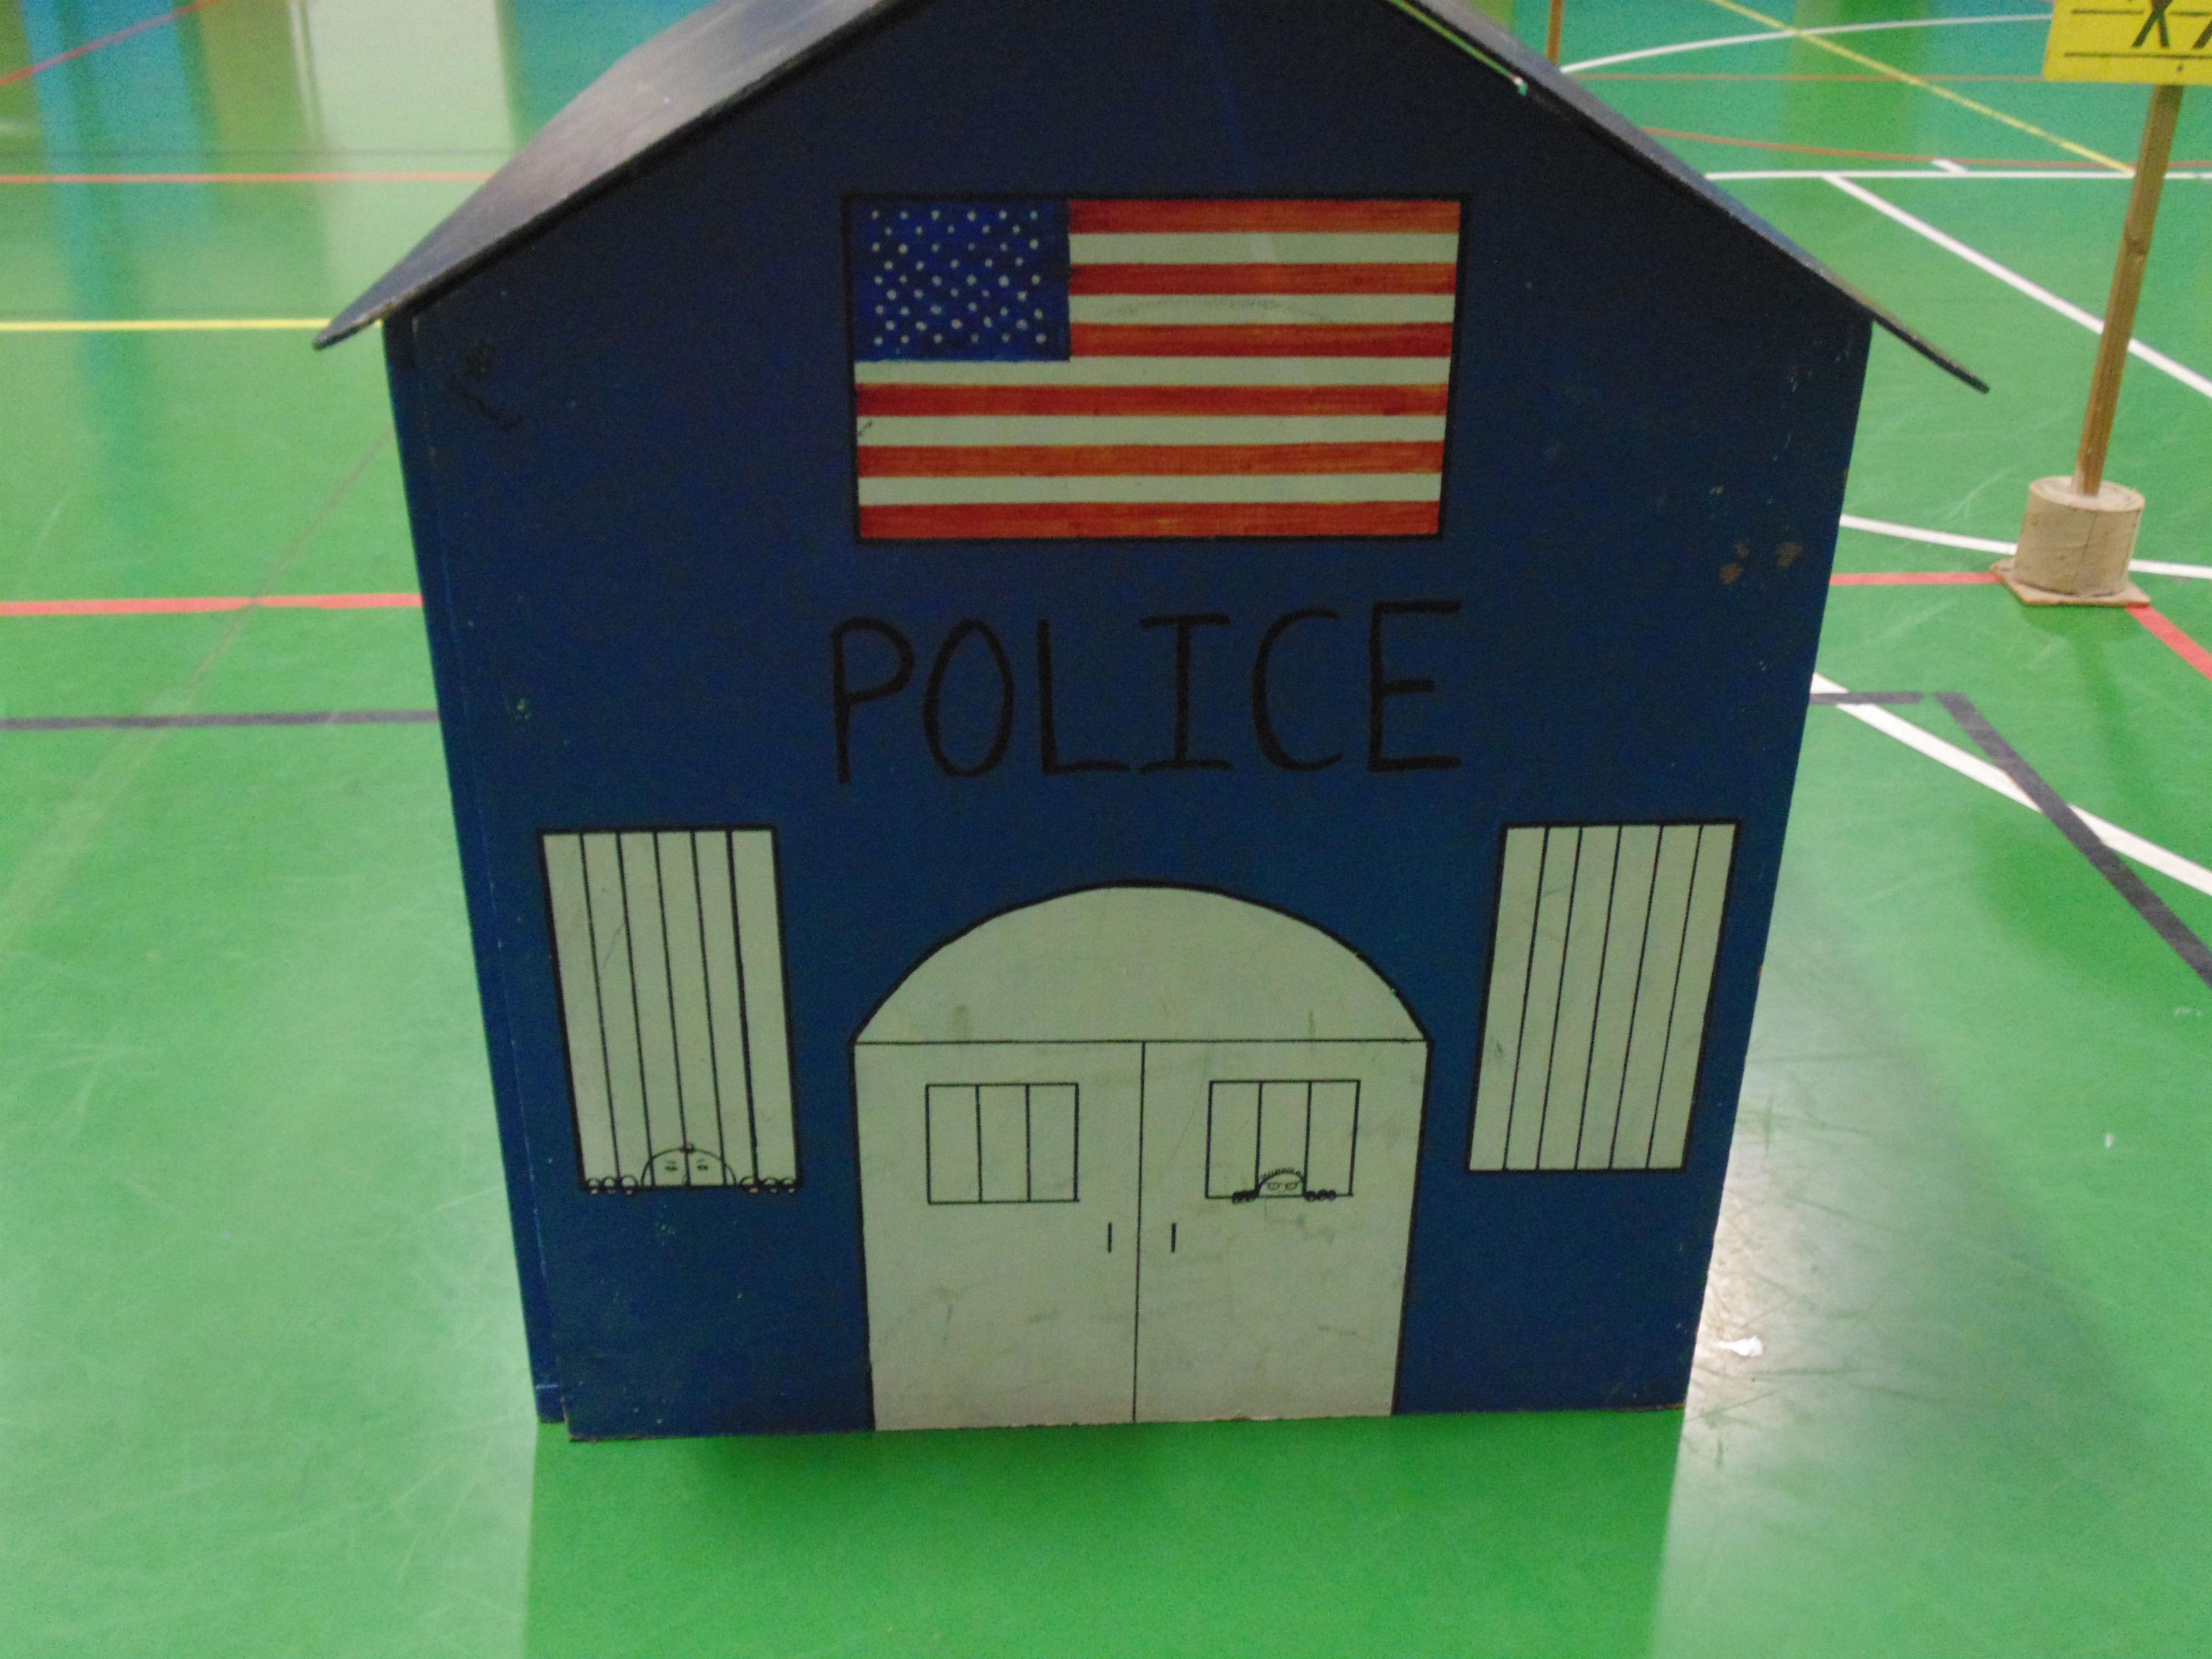 c1879c6c2eb11841fed1_Police_Station.jpg